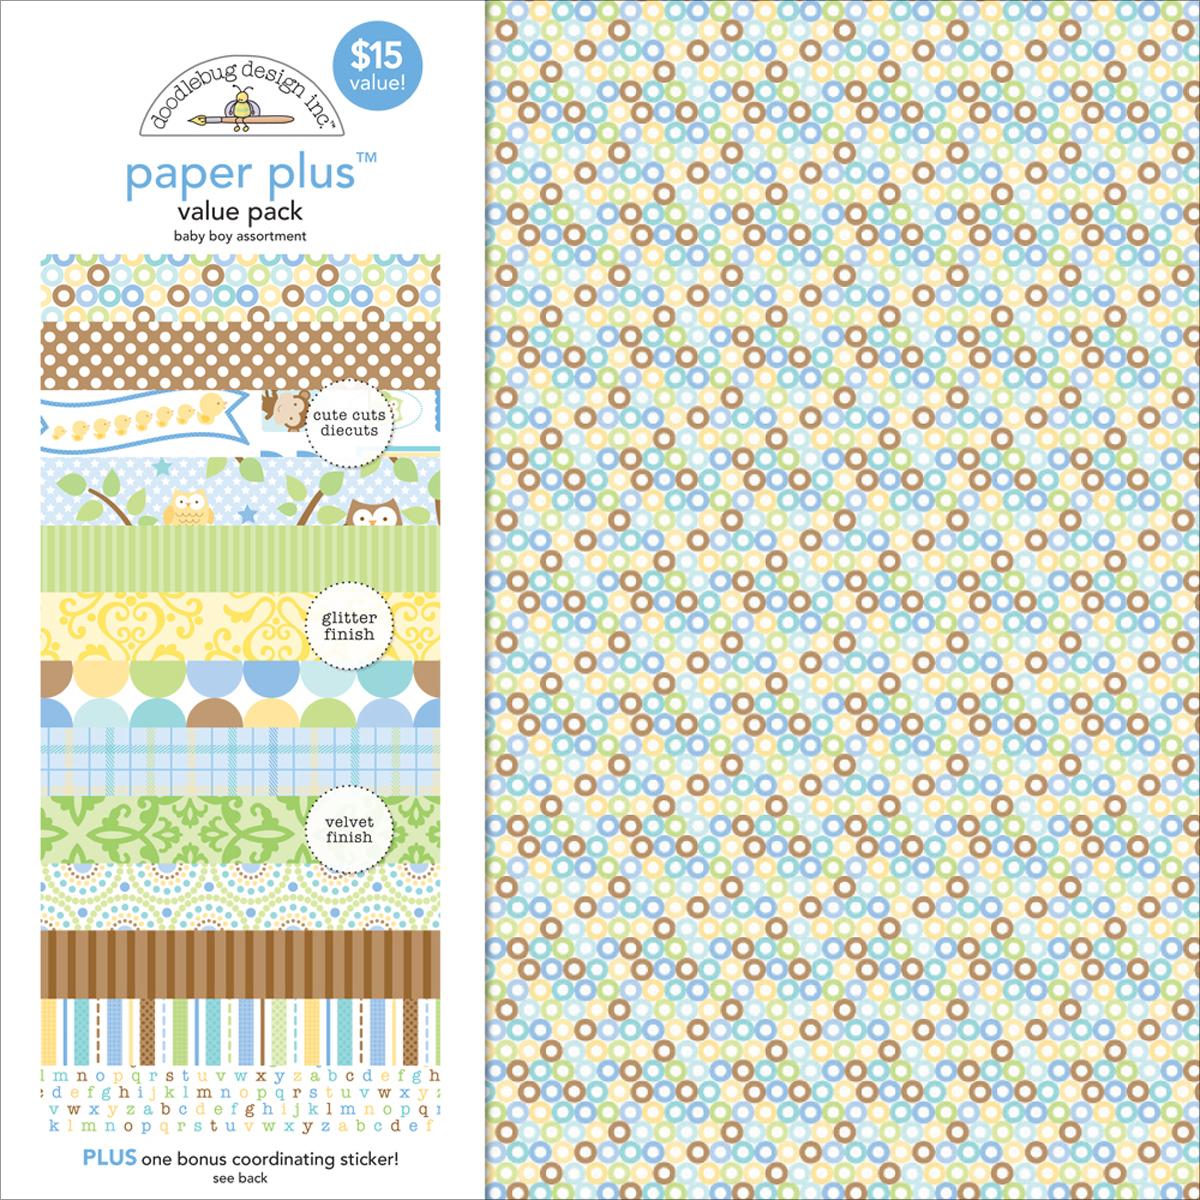 ^Doodlebug Baby Boy Assortment - 12x12 Paper Plus Value Pack